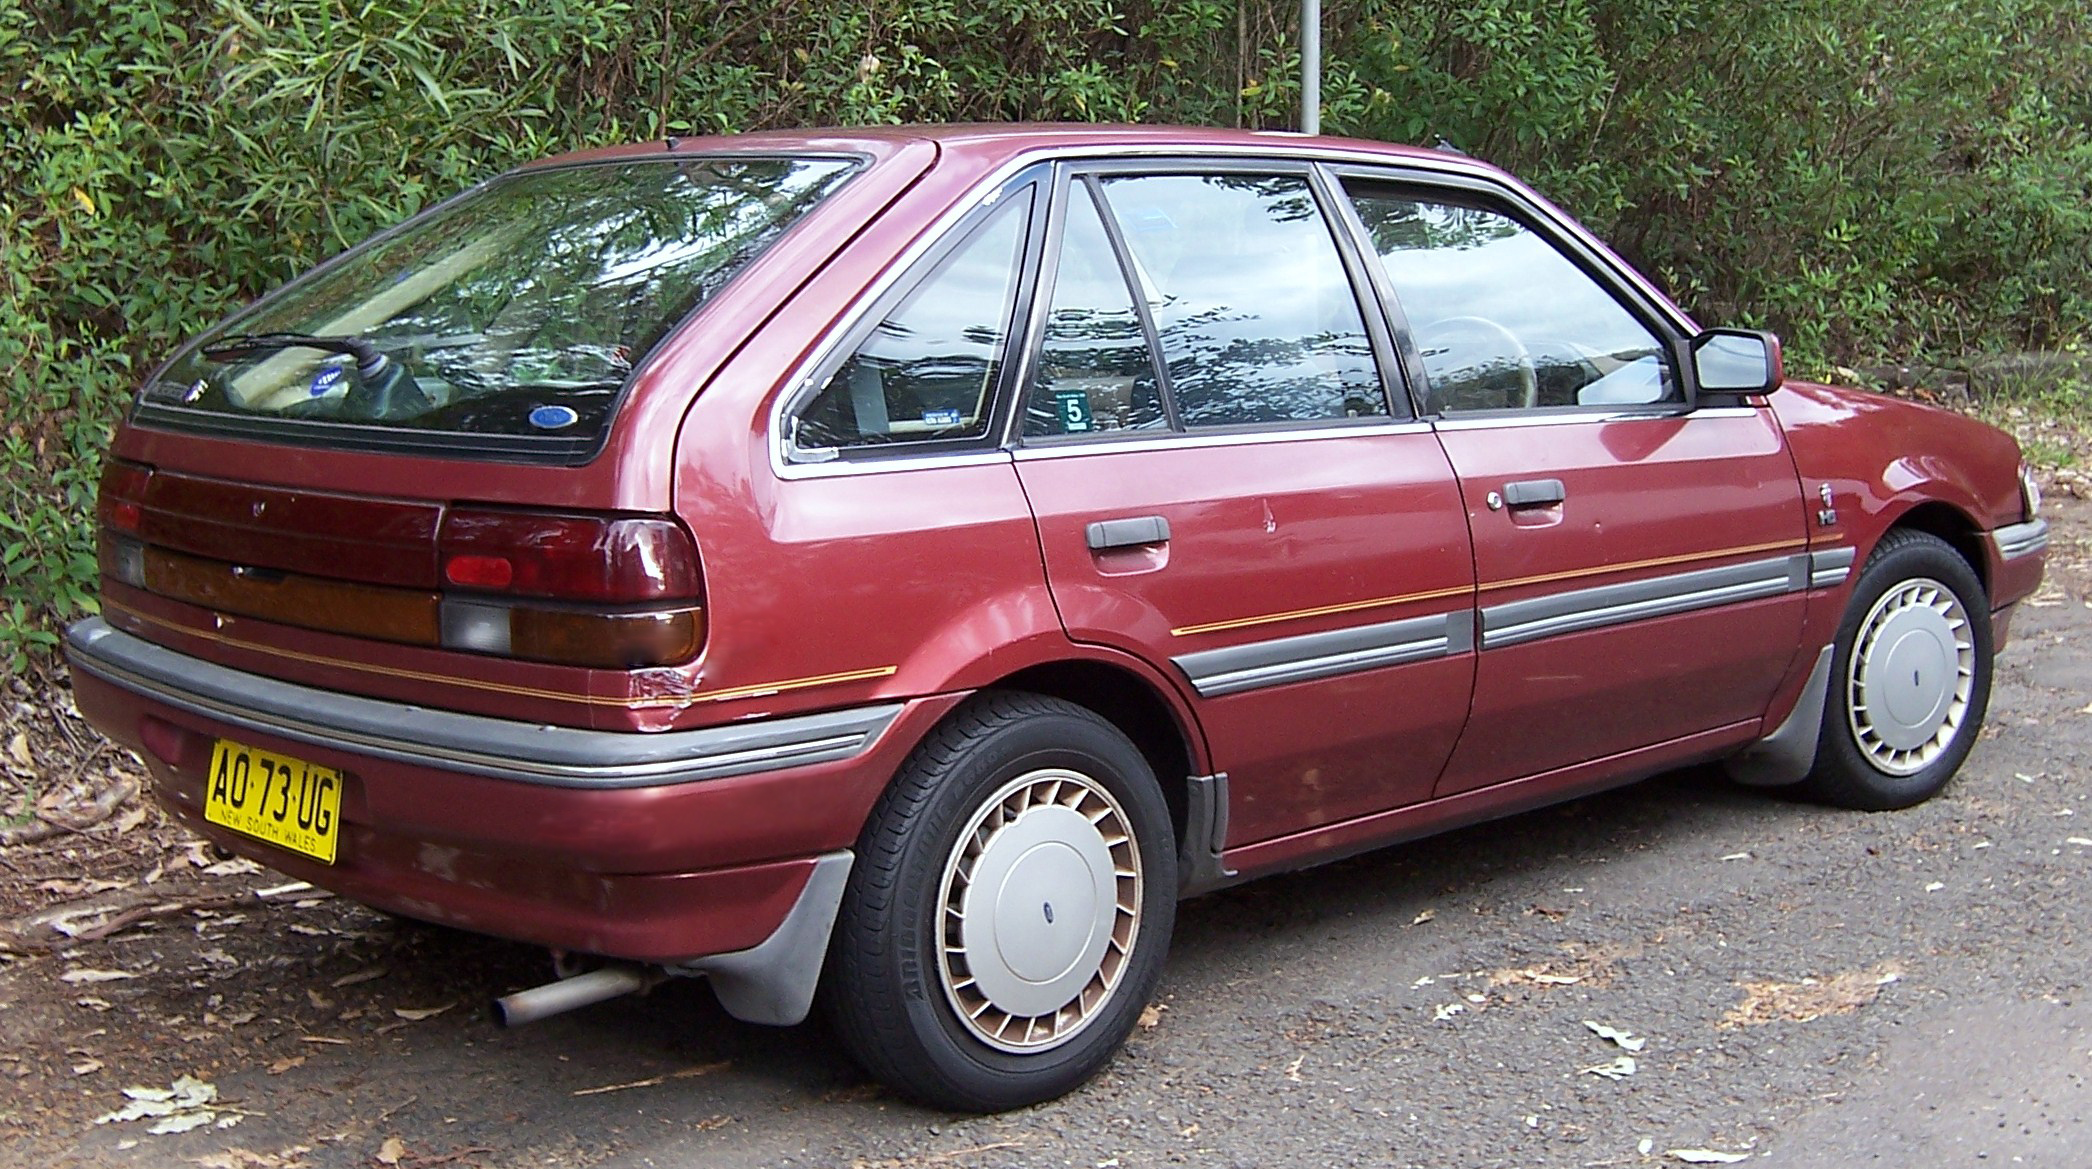 File:1987-1990 Ford Laser (KE) Ghia 5-door hatchback 02.jpg - Wikimedia Commons